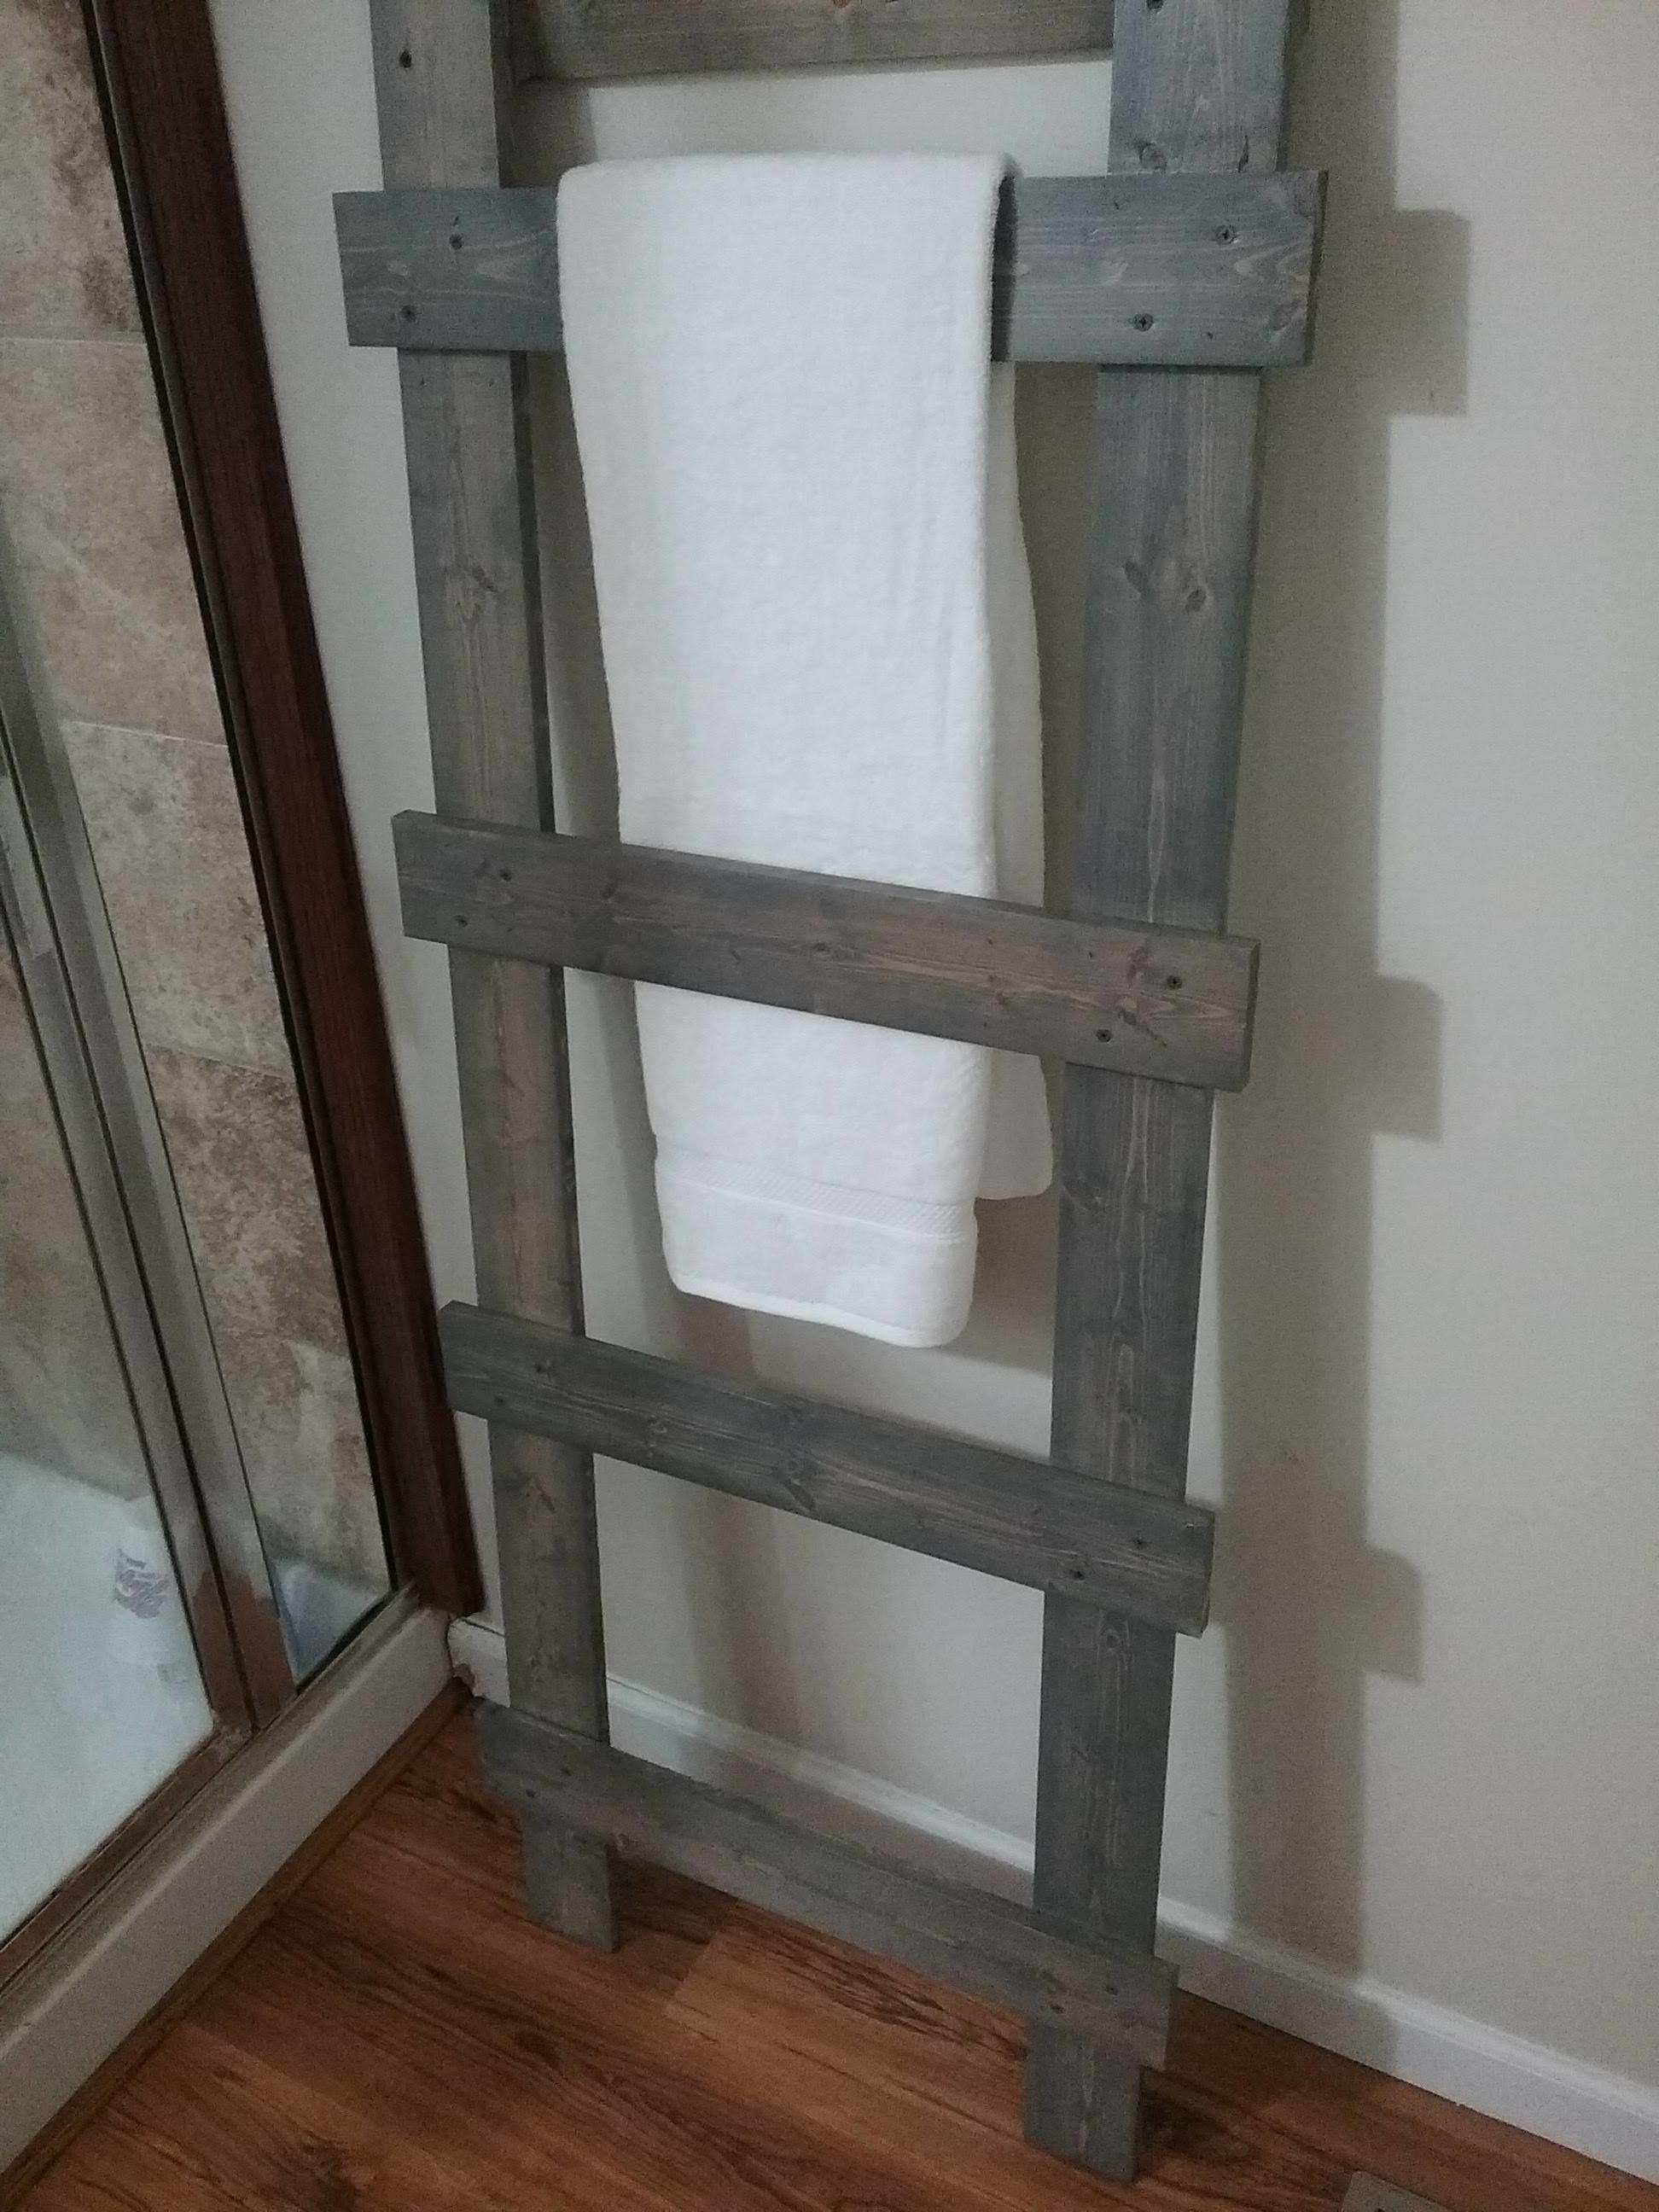 Towel ladder - weathered towel ladder $80.00